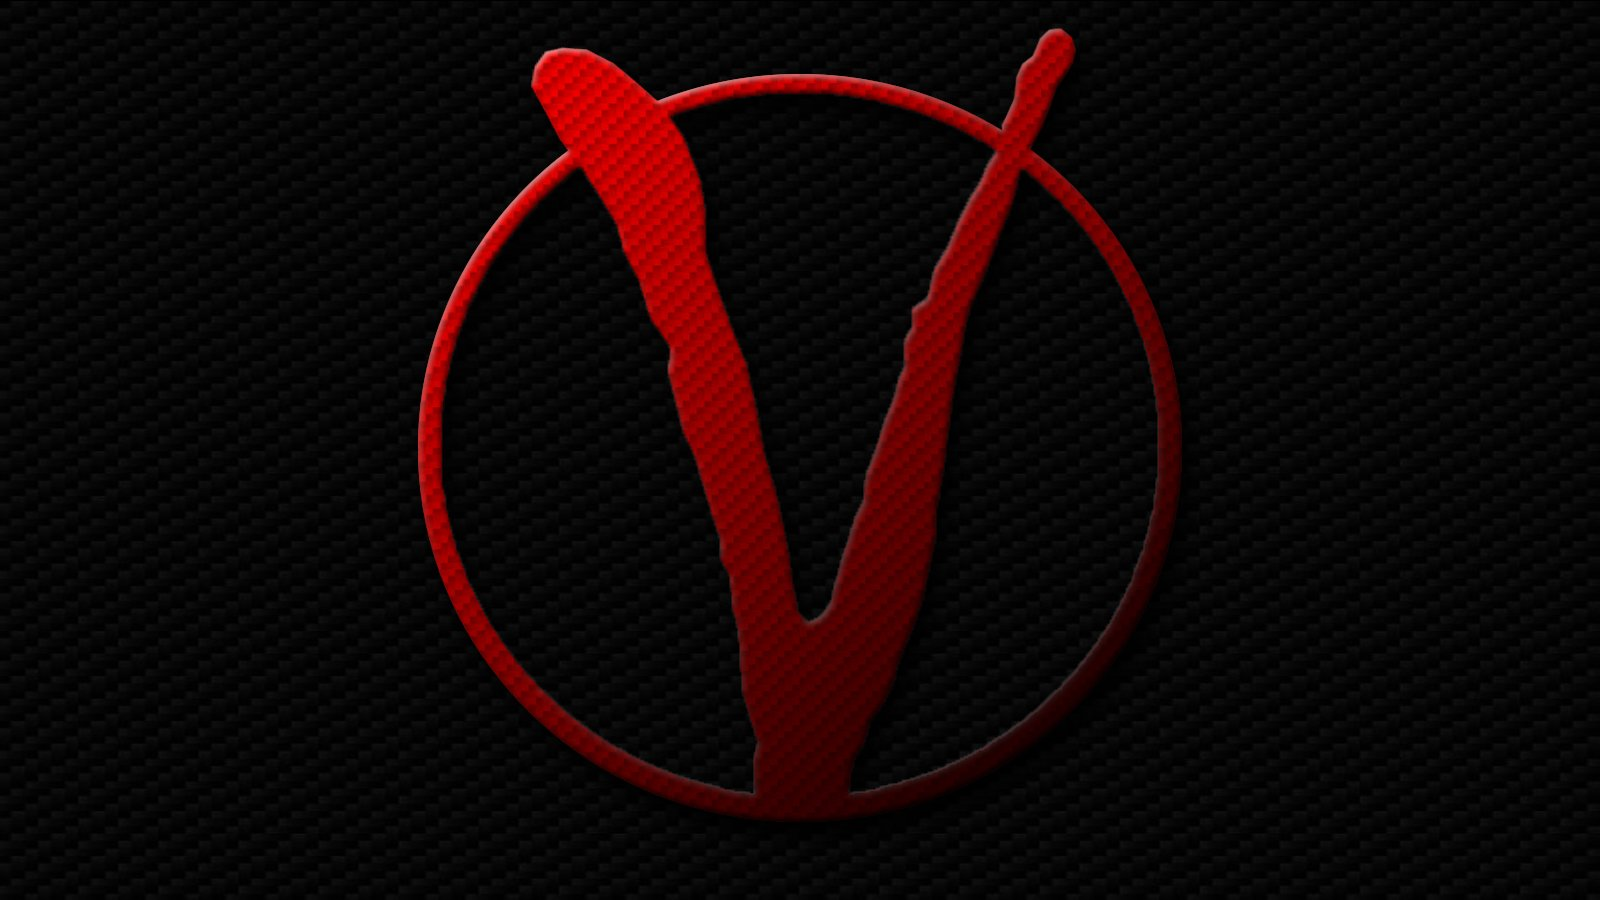 symbol v for vendetta black background wallpaper | 1600x900 | 326640